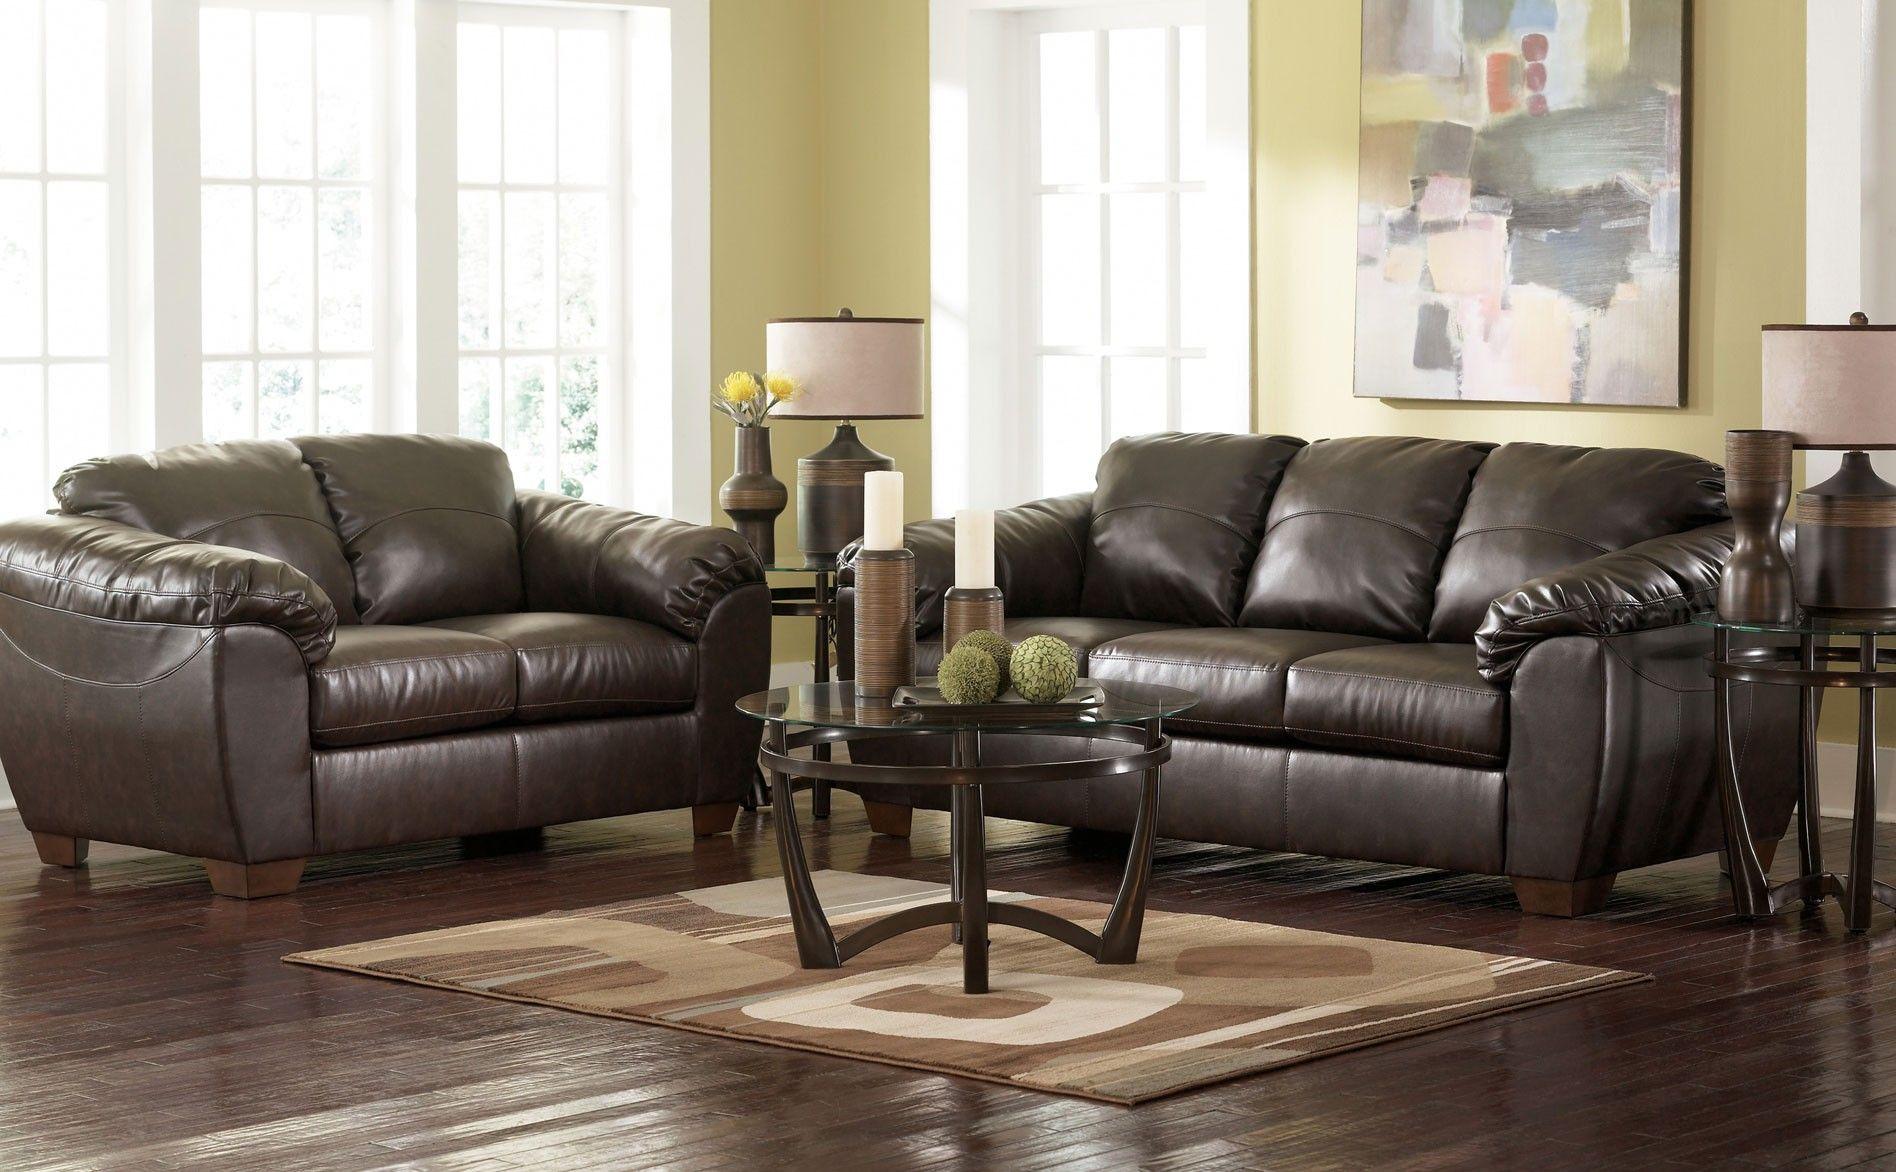 Superbe Ashley Furniture Leather   Google Search